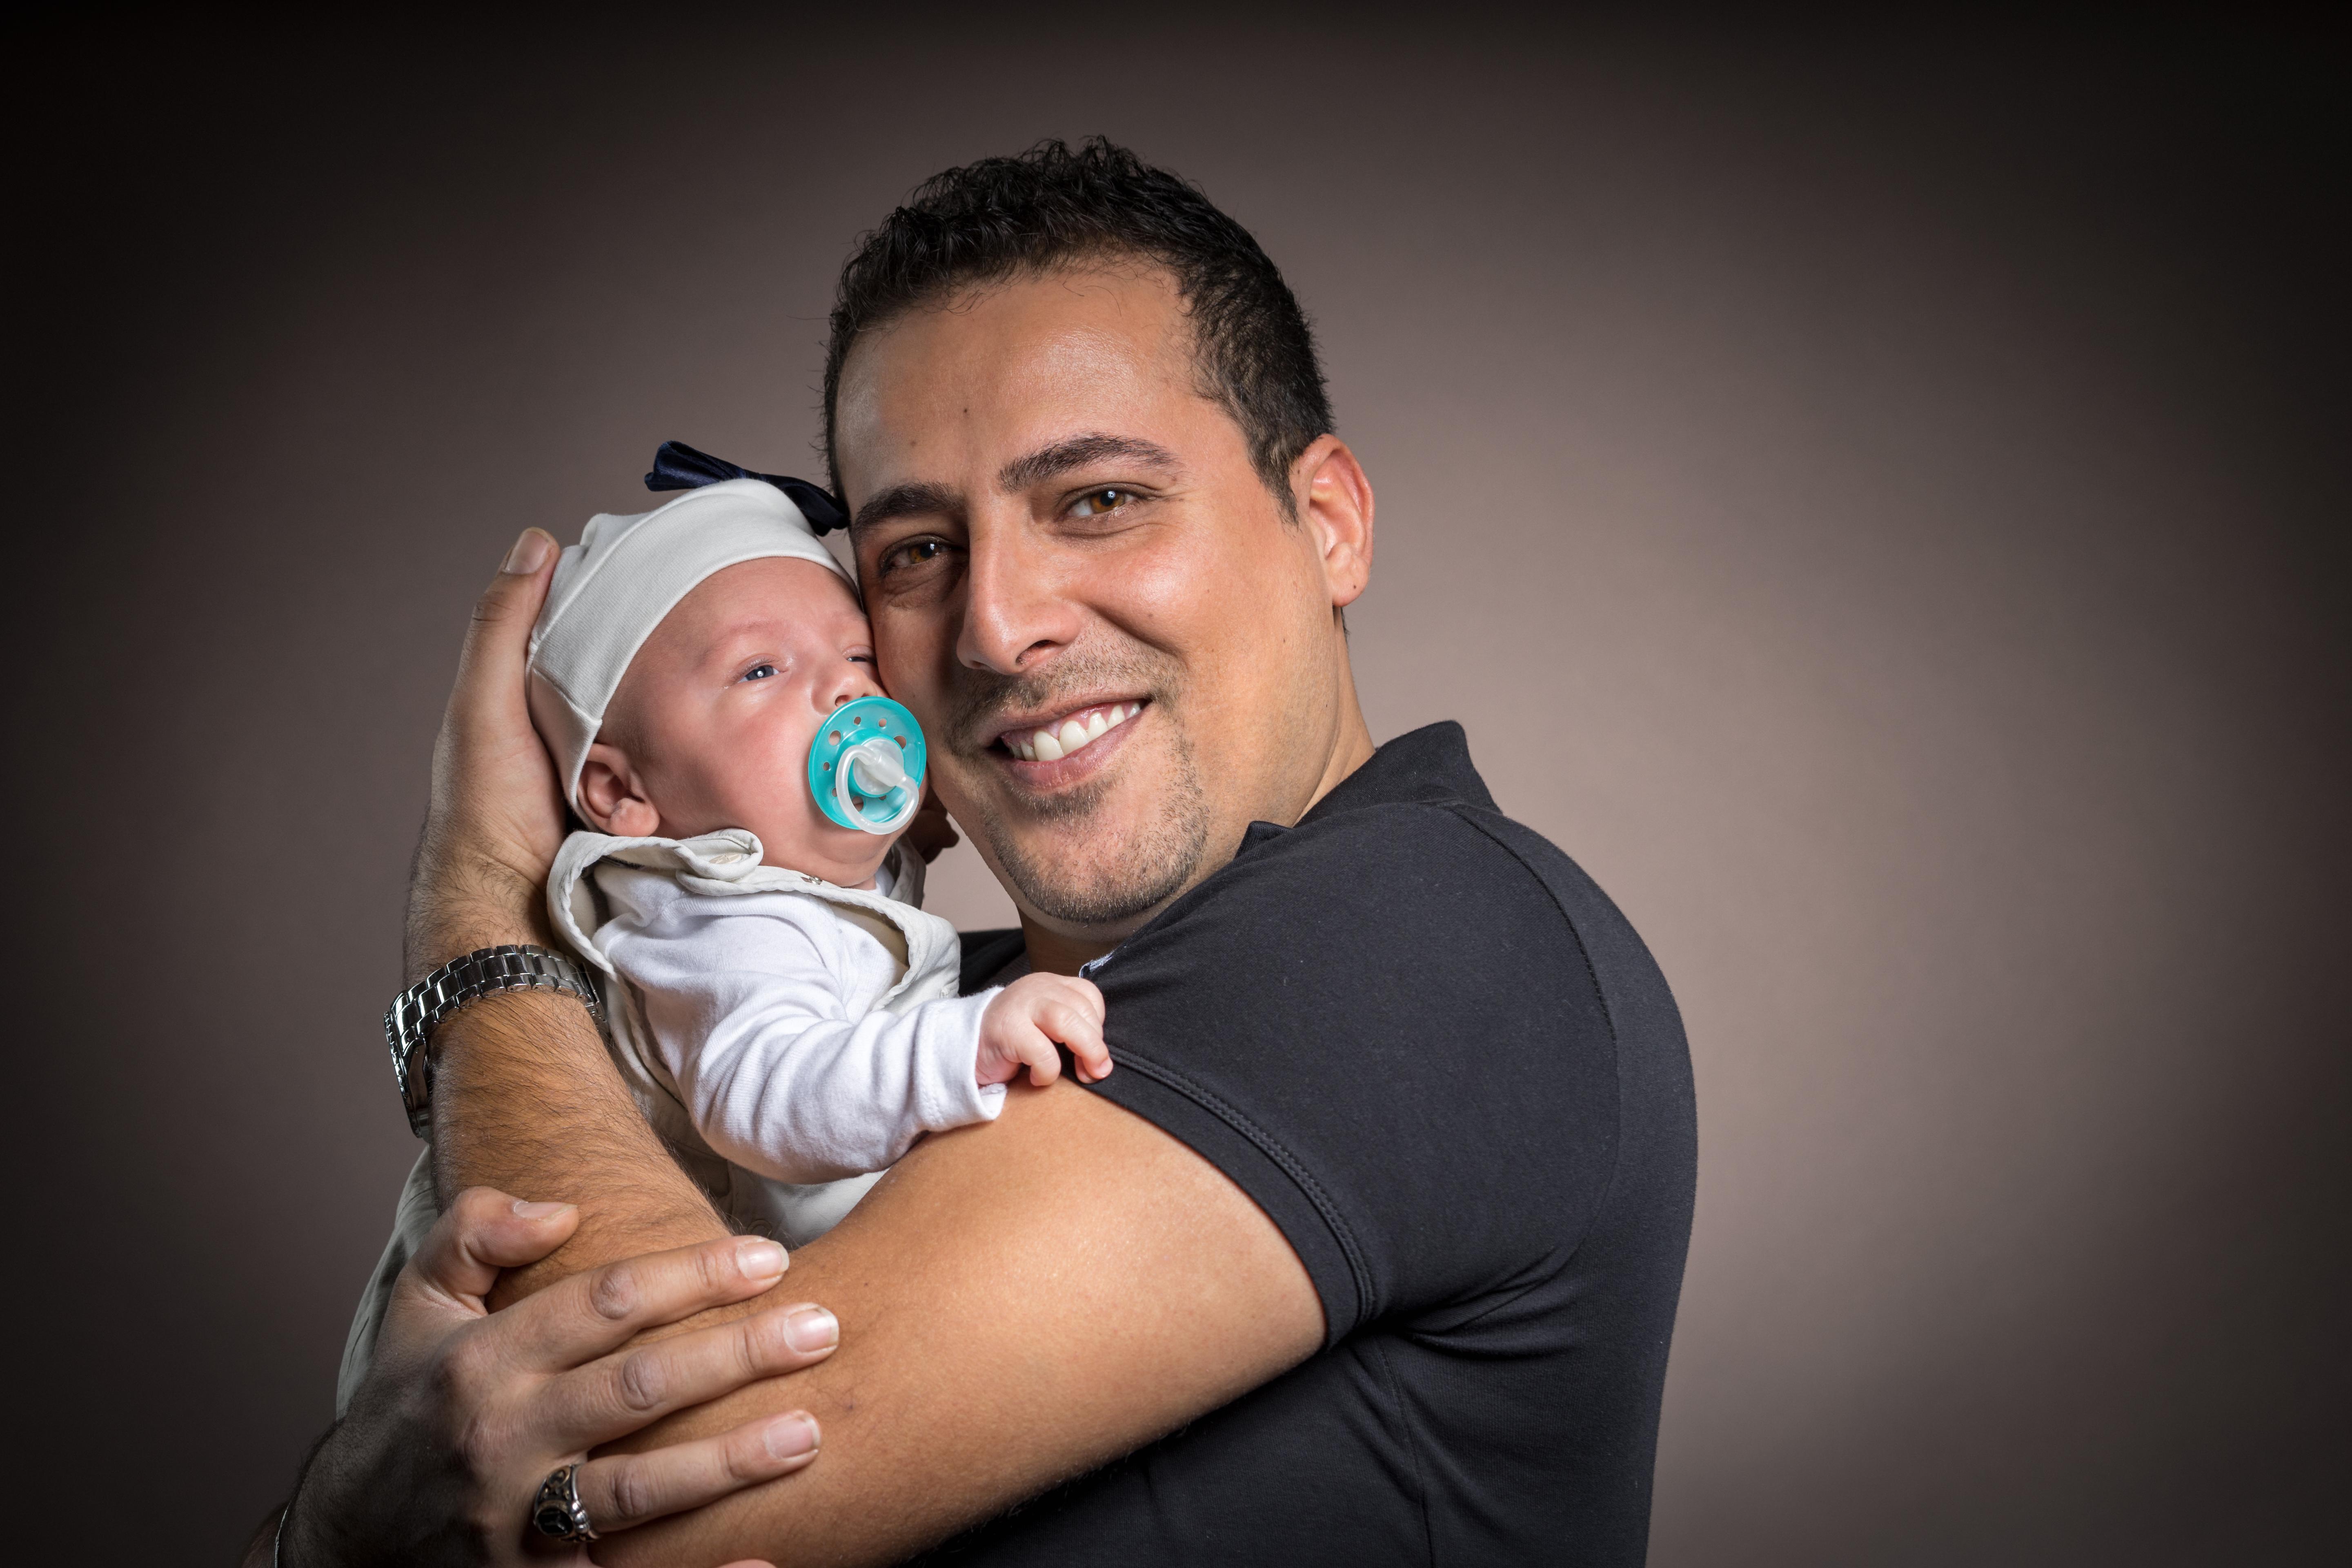 Babyfotografie - marc Fotografie